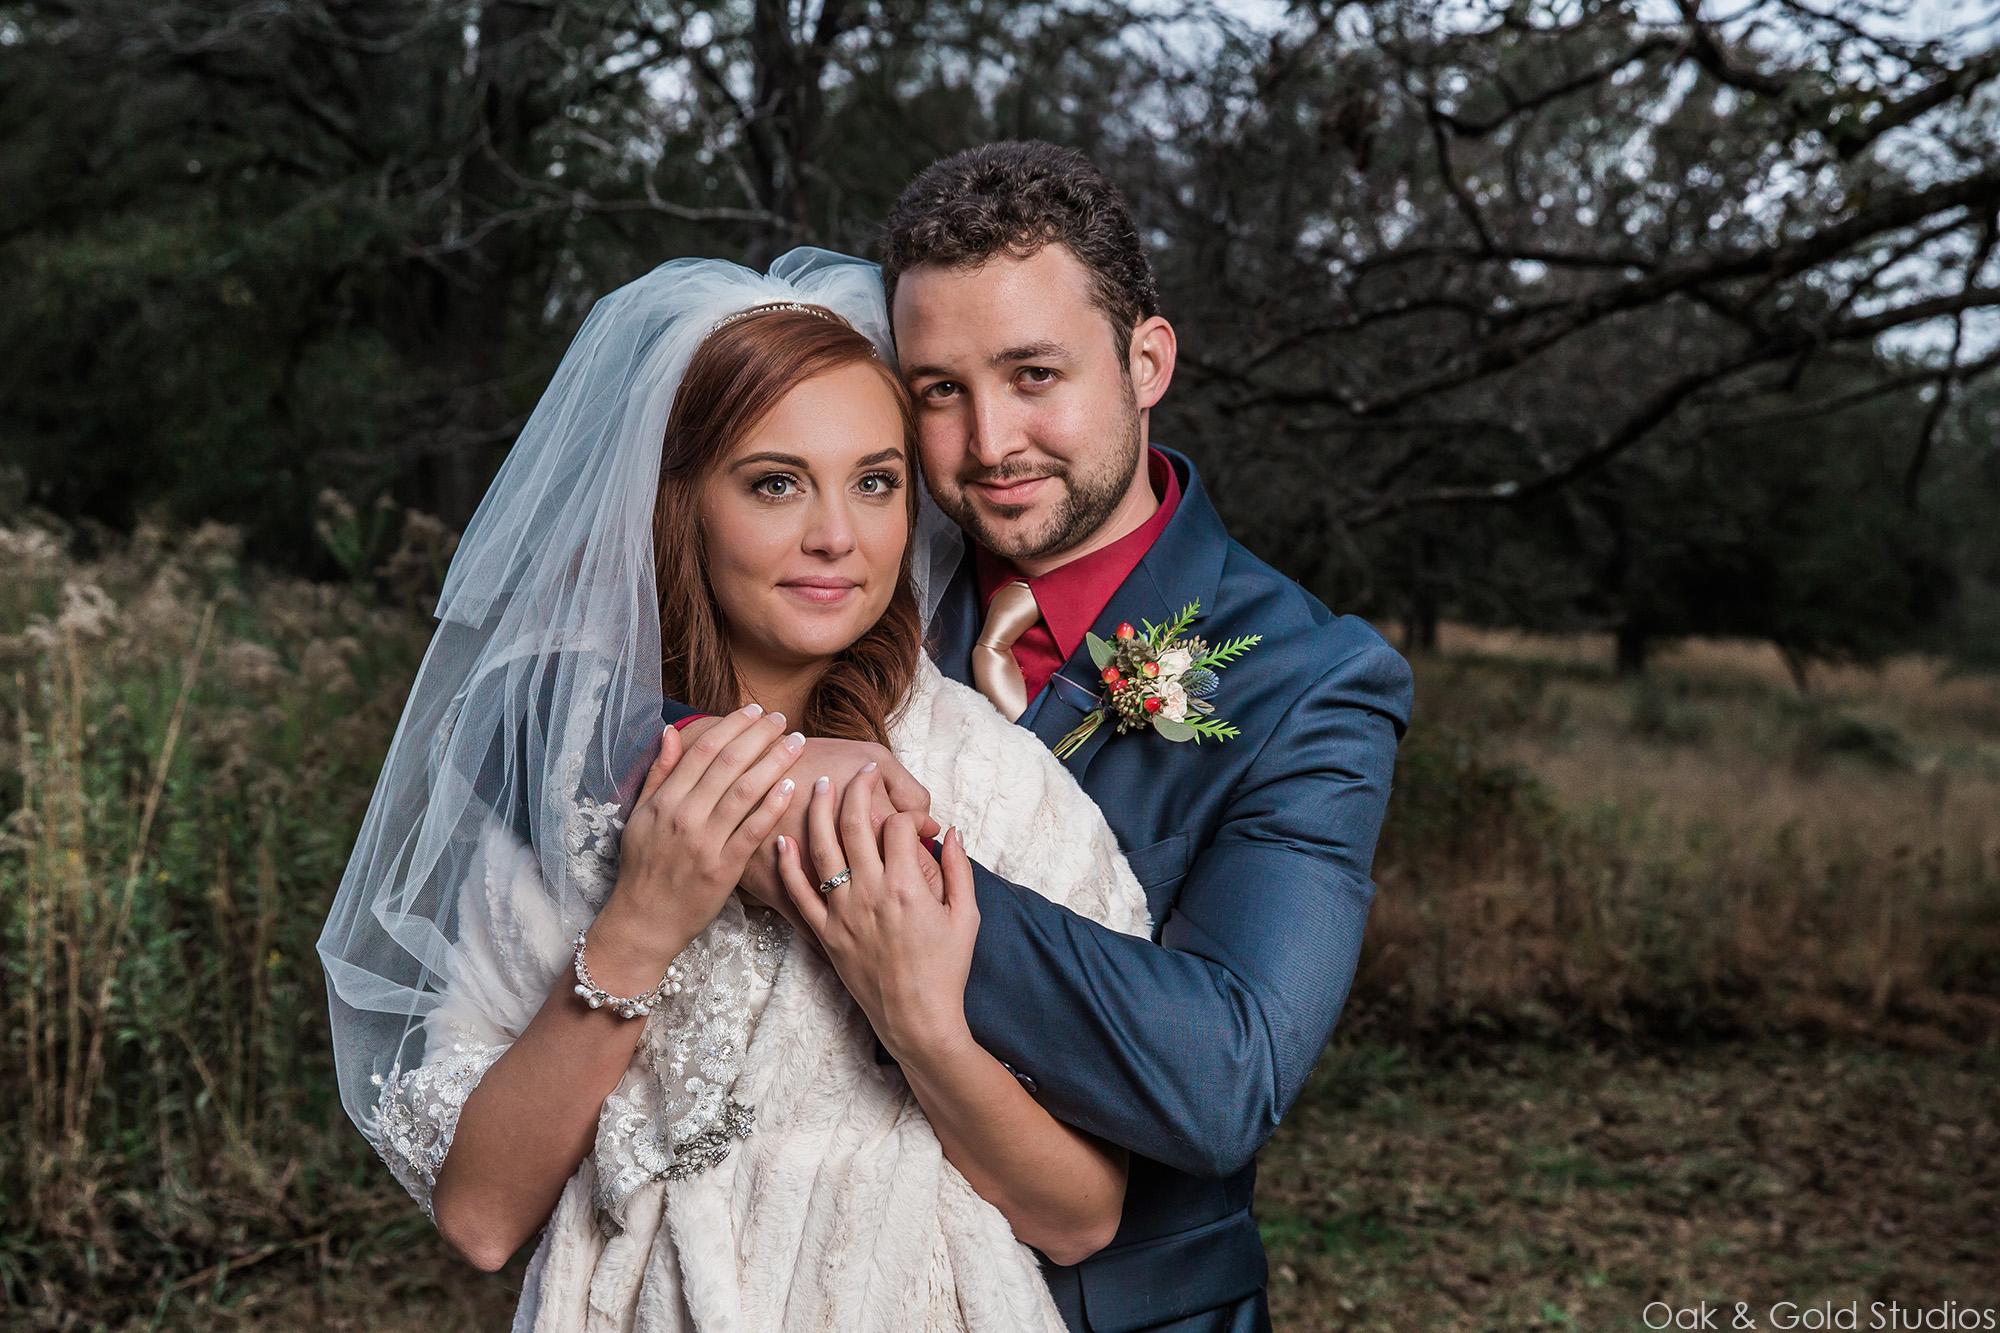 bride-and-groom-plantation.jpg